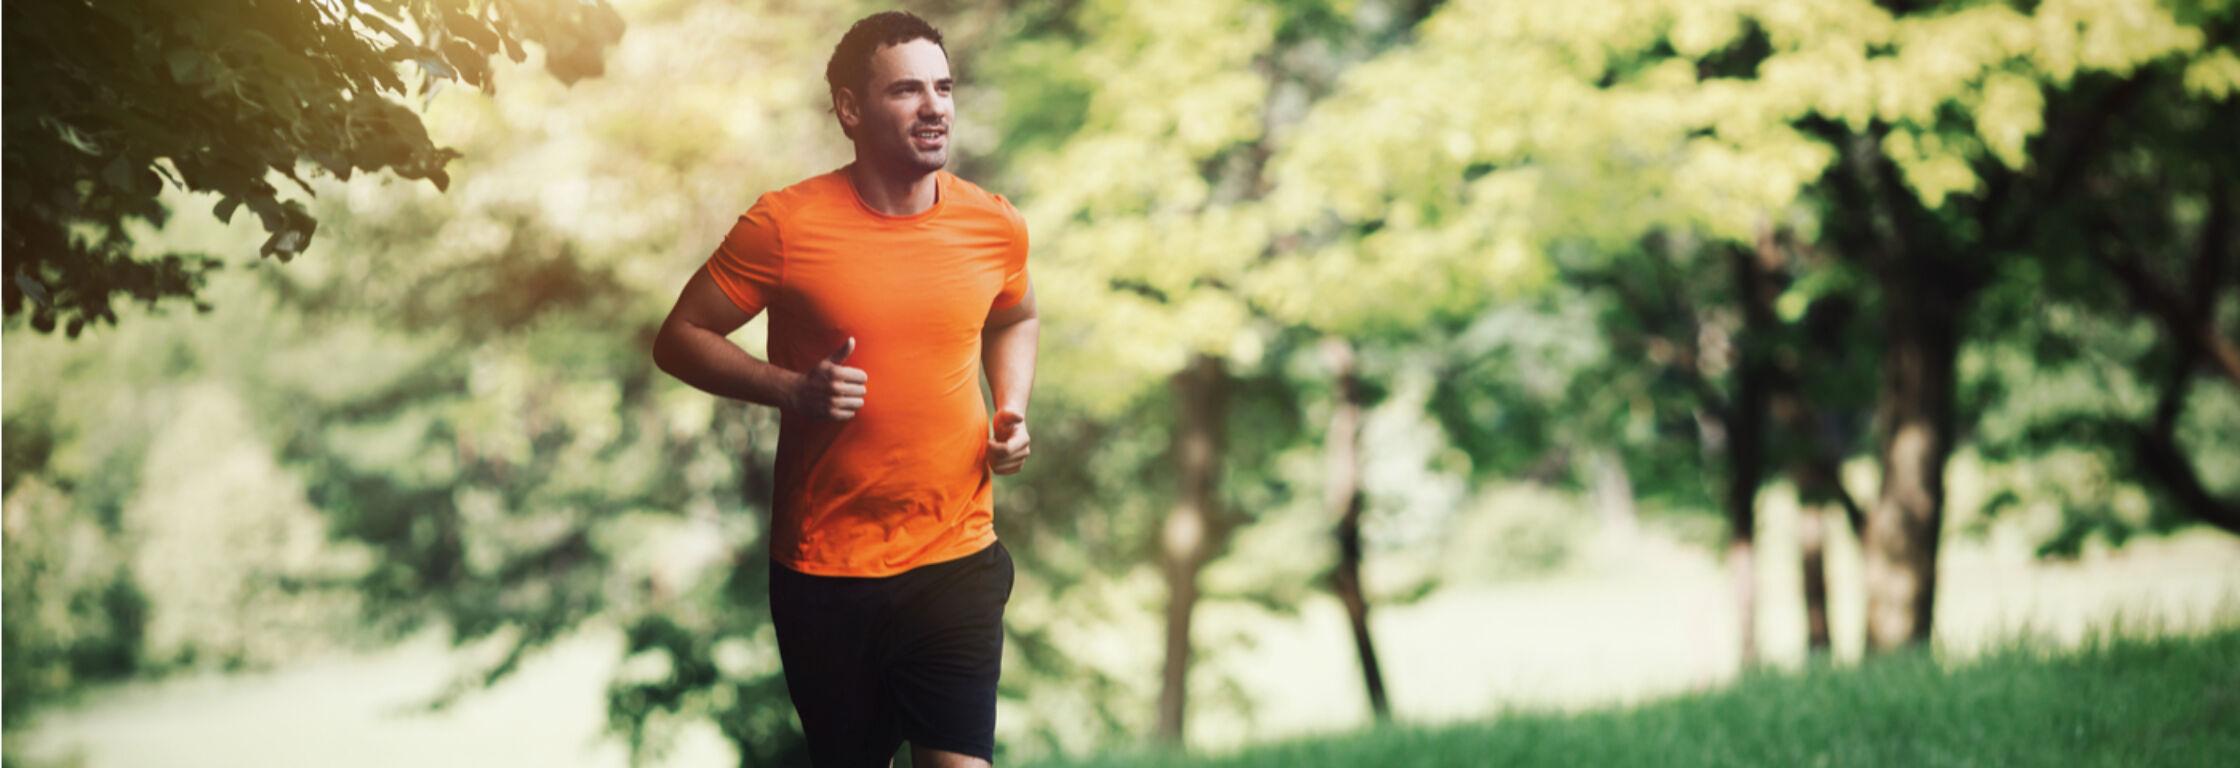 Lichaamssamenstelling: wat is mijn lichaamsbouw?